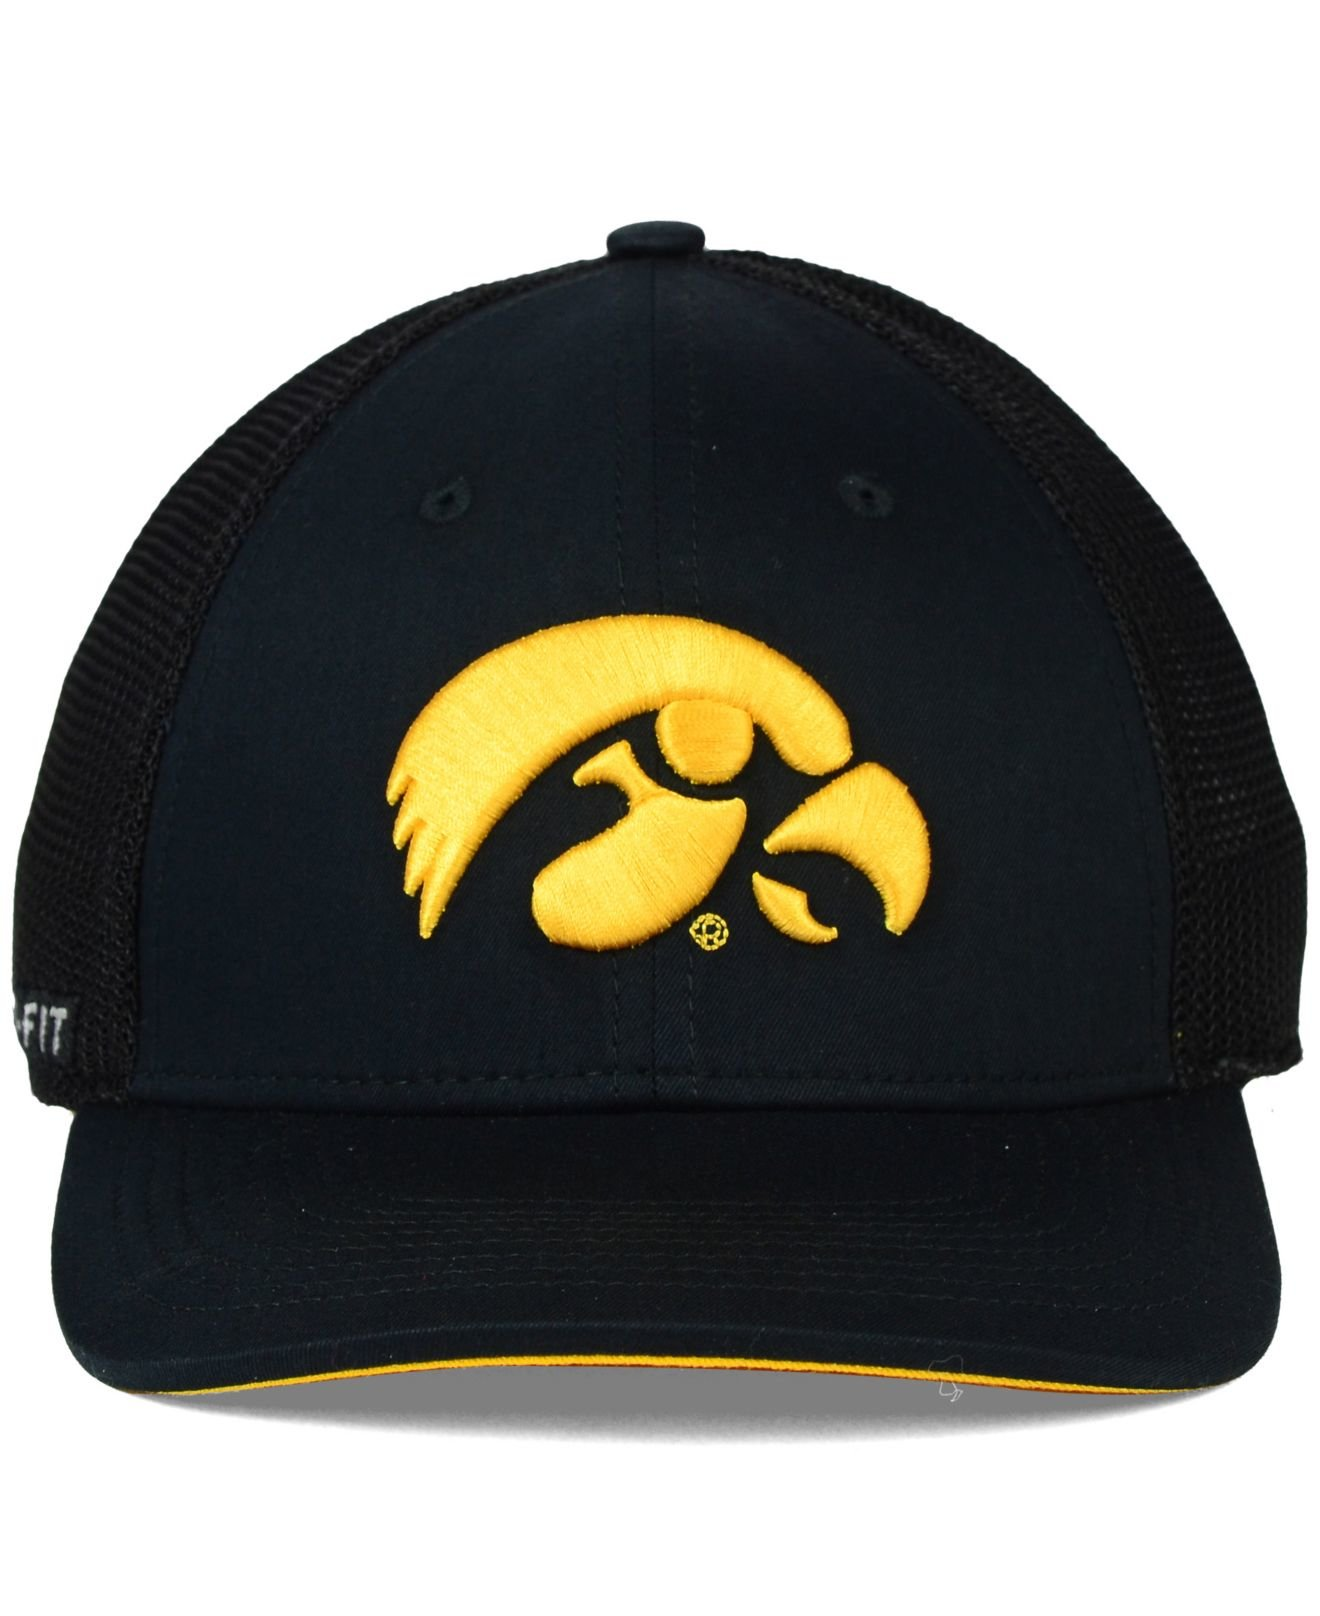 competitive price d45b2 ea019 Nike Iowa Hawkeyes L91 Swoosh Flex Stretch-Fit Cap in Black for Men ...